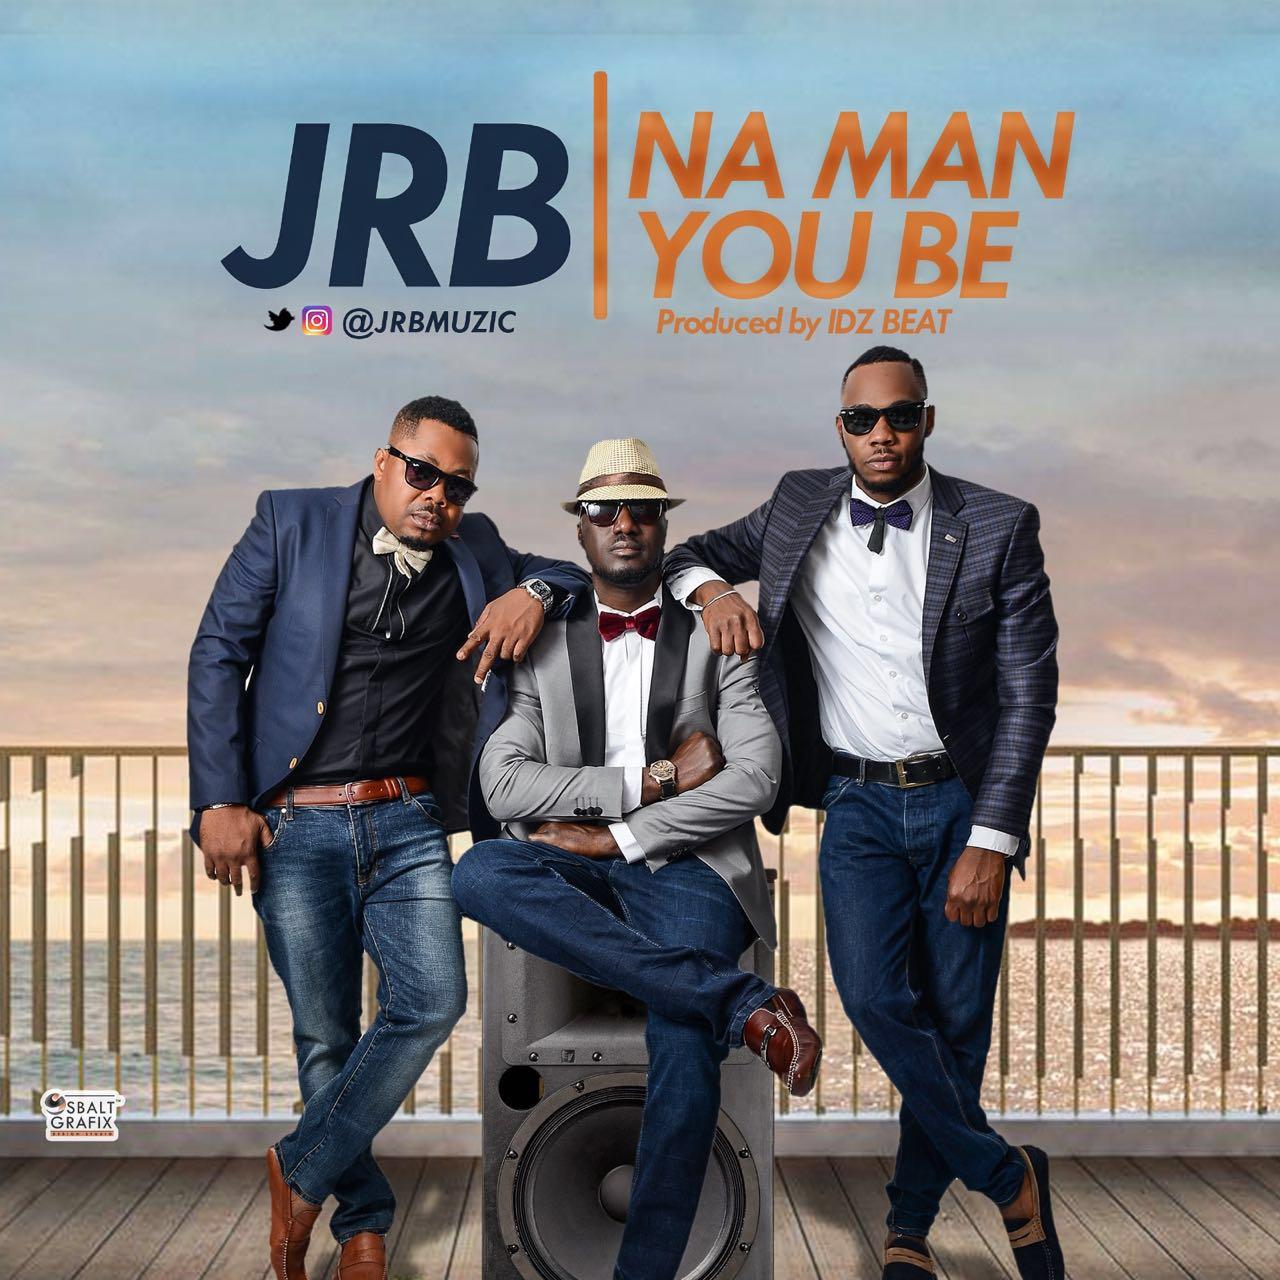 JRB - Na Man You Be artwork